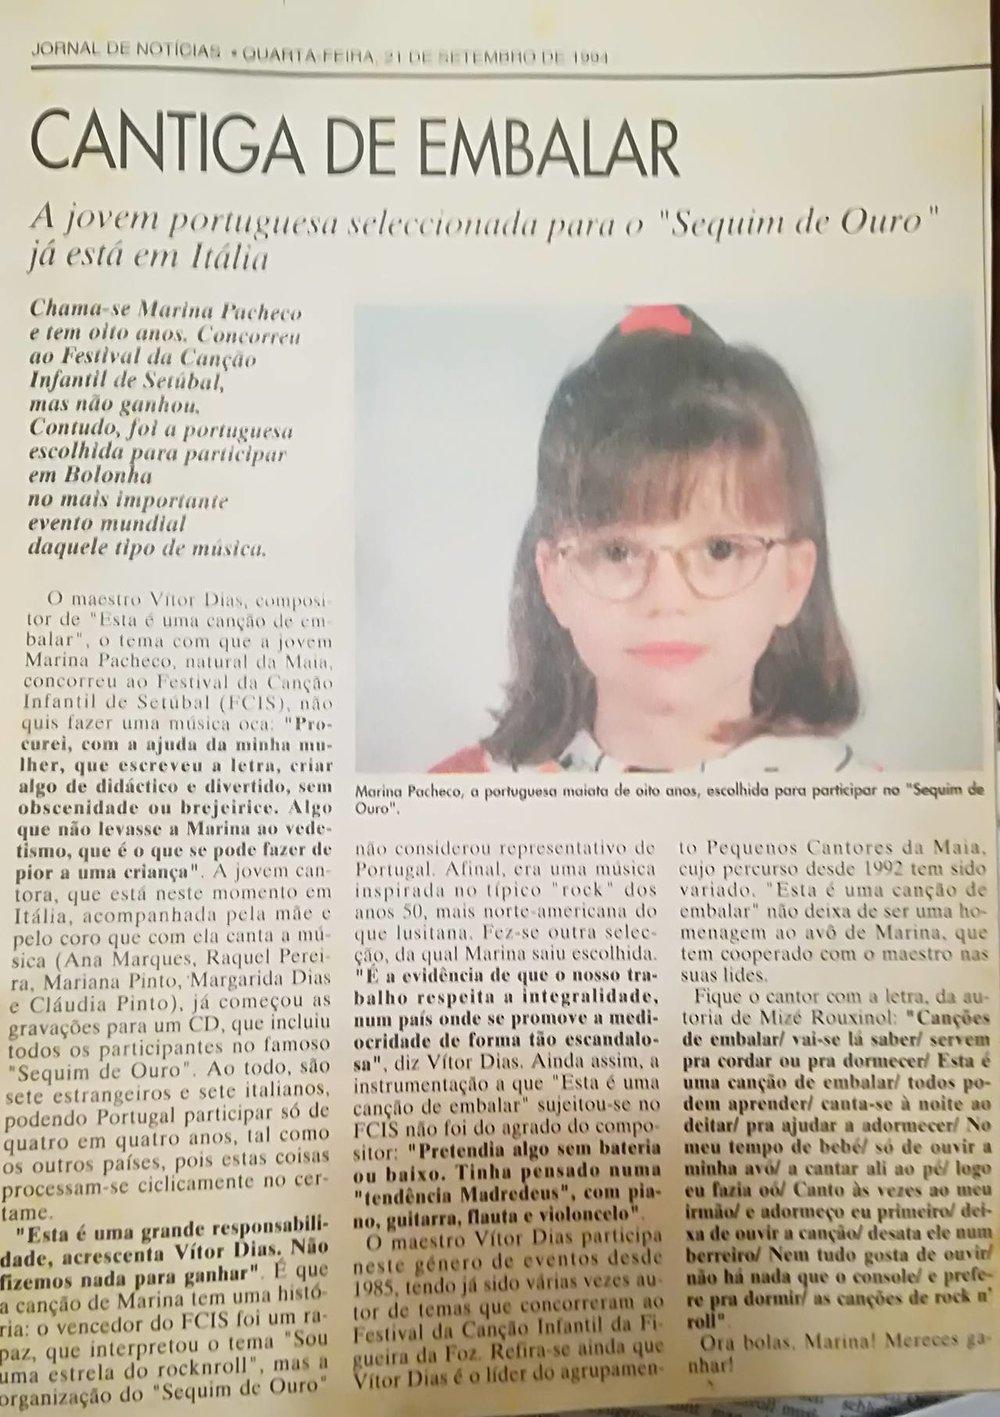 """Cantiga de Embalar"" in Jornal de Notícias"